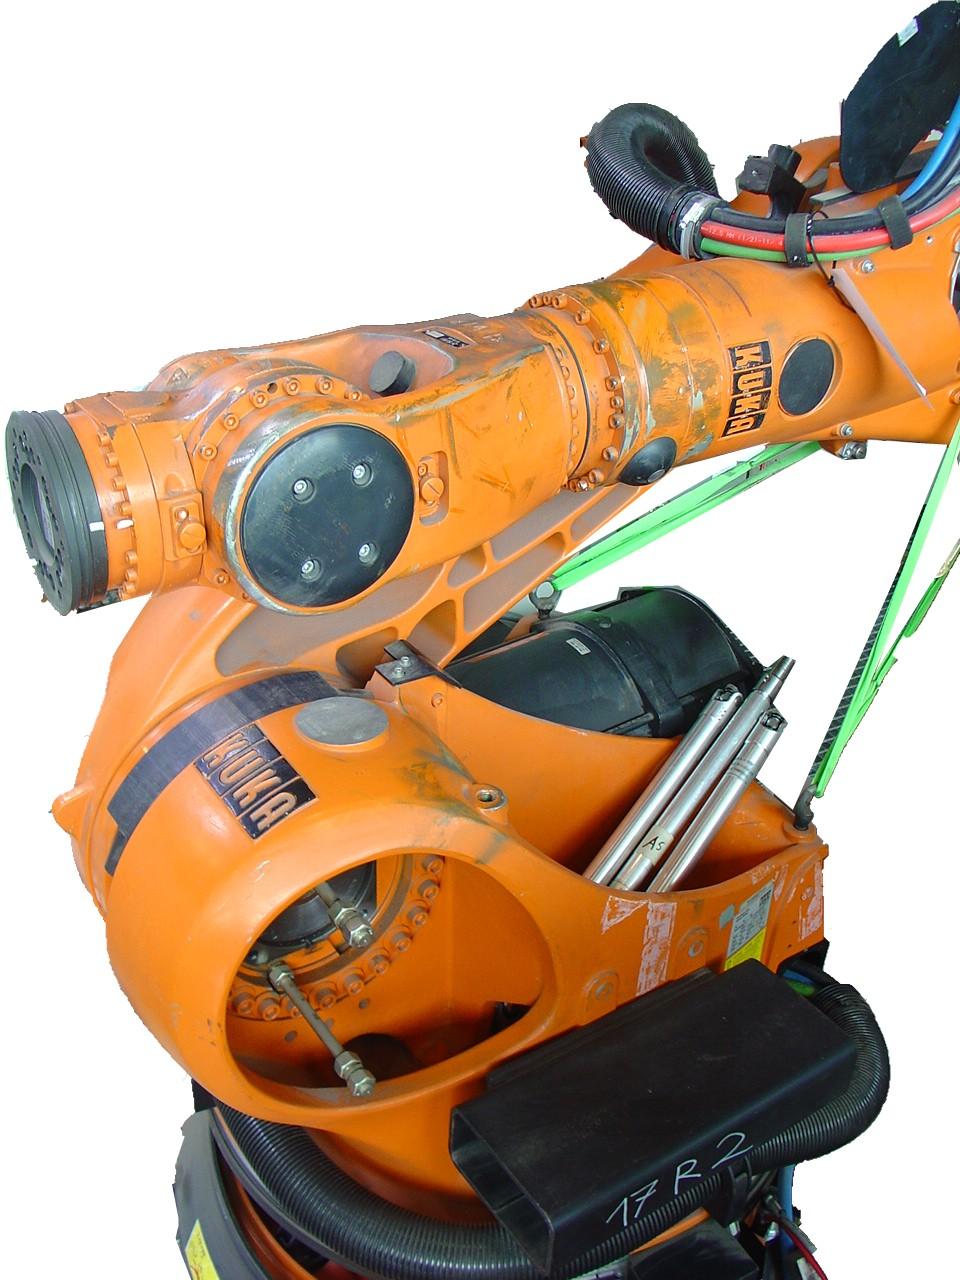 Kuka KR150 Industrial Robot - Exapro